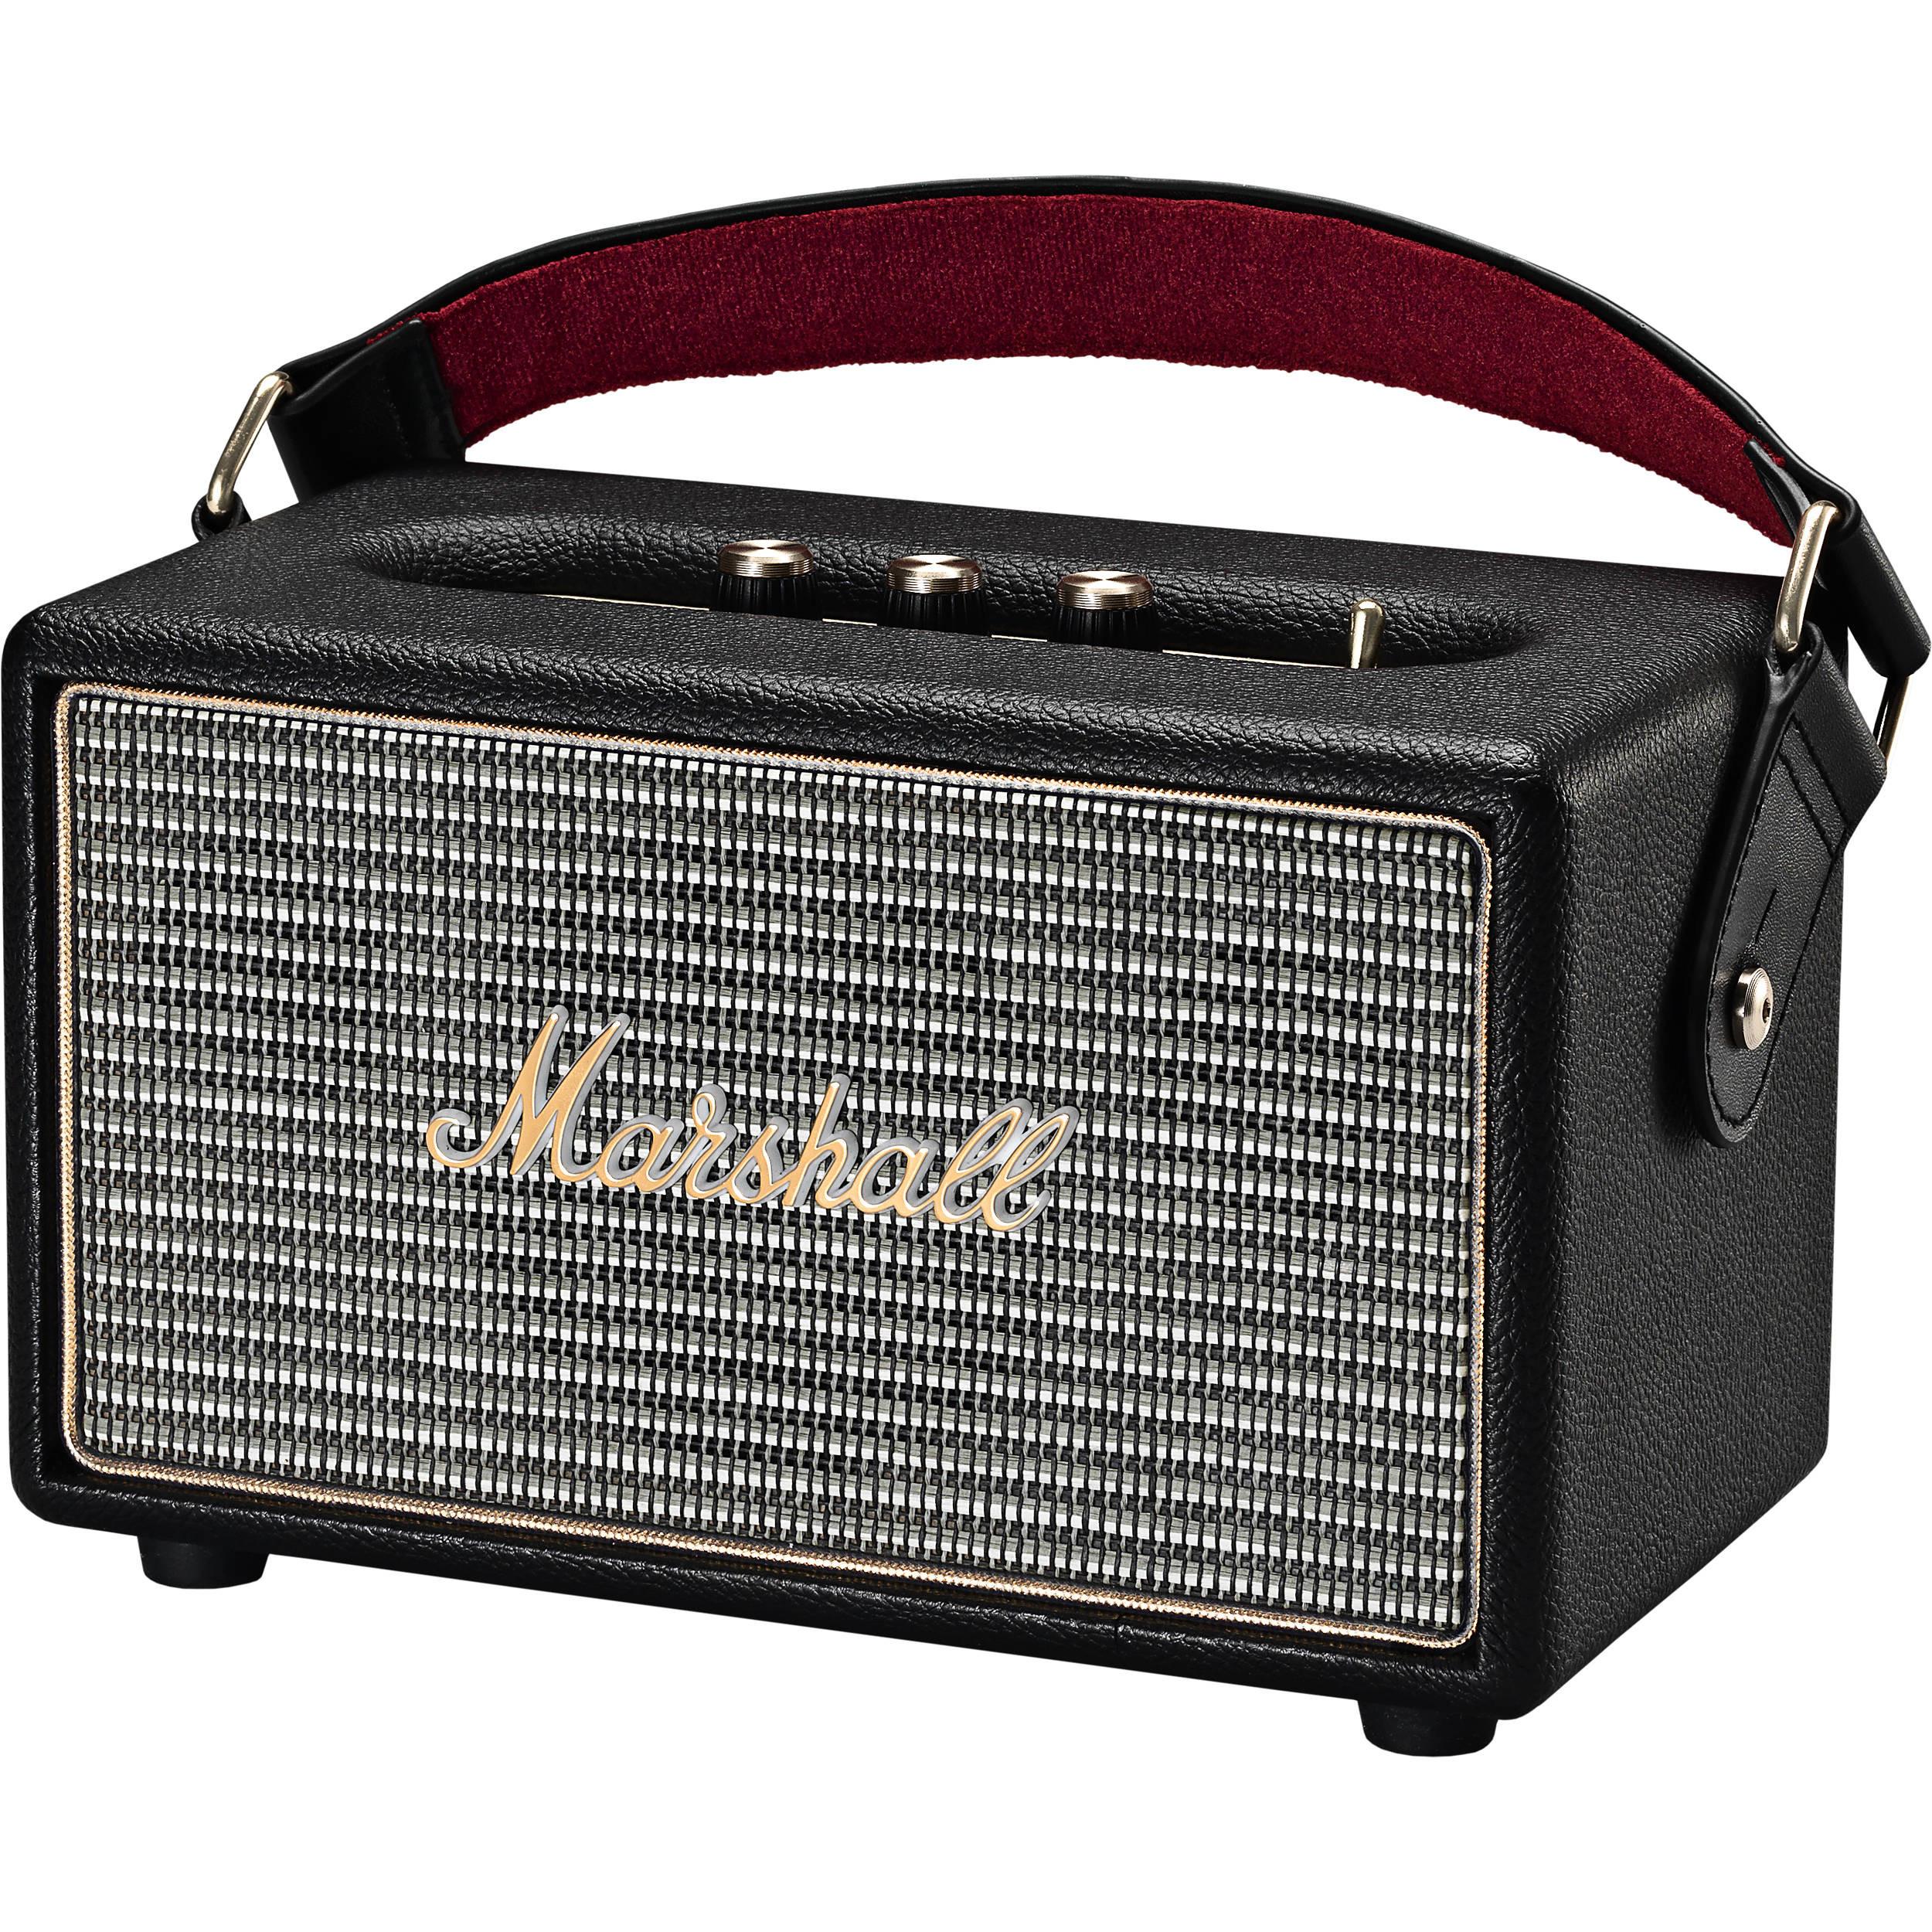 Marshall KILBURN Bluetooth Stereo Speaker Black